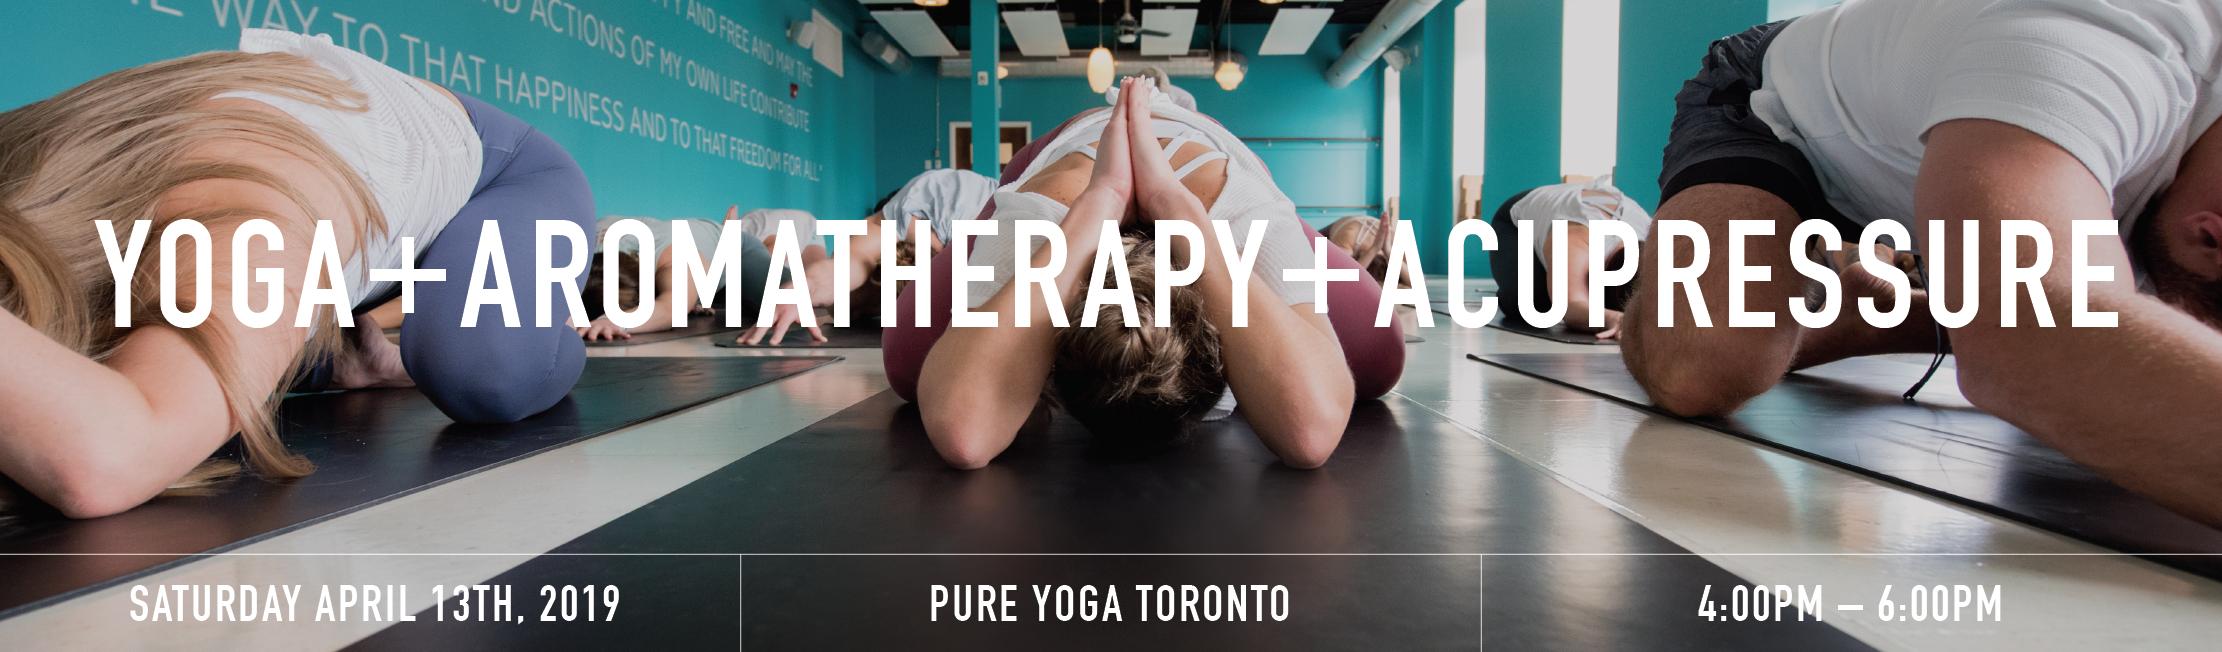 Yoga aromatherapy acupressure banner  1